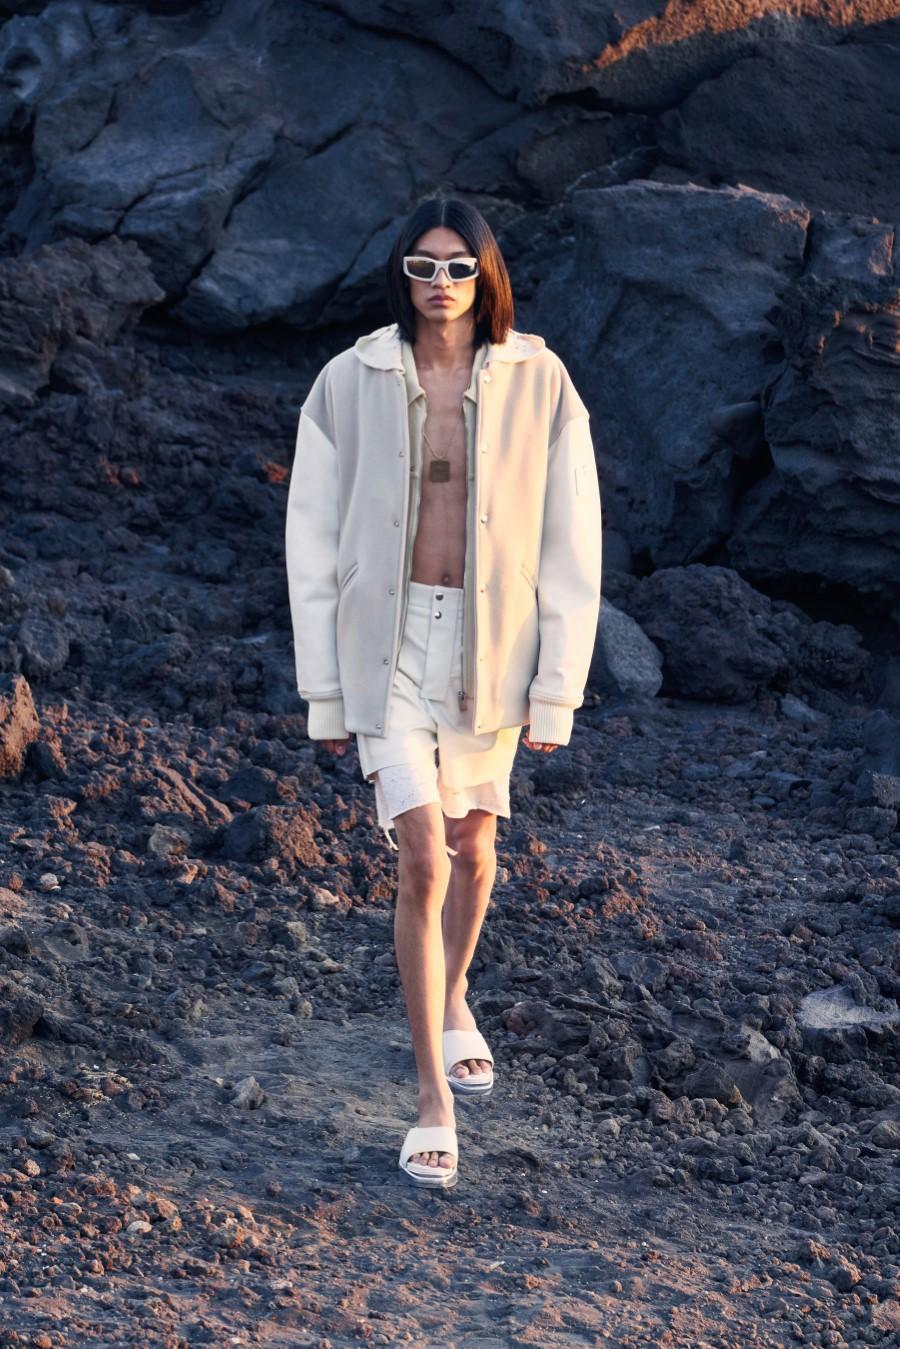 1017 Alyx 9SM Spring Summer 2022 - Paris Fashion Week Men's